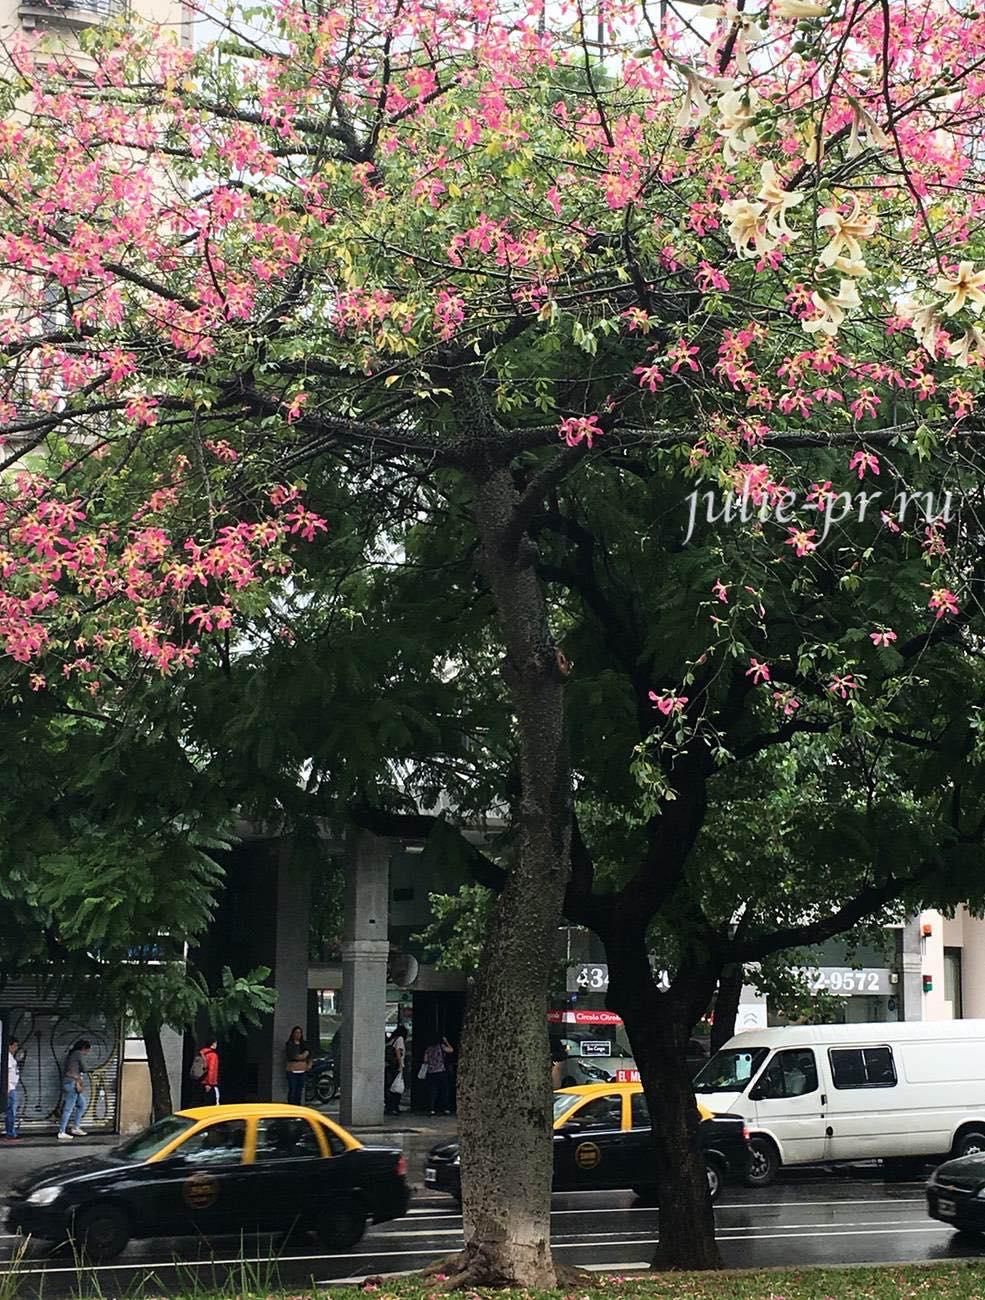 Аргентина, Буэнос-Айрес, Цветущее дерево